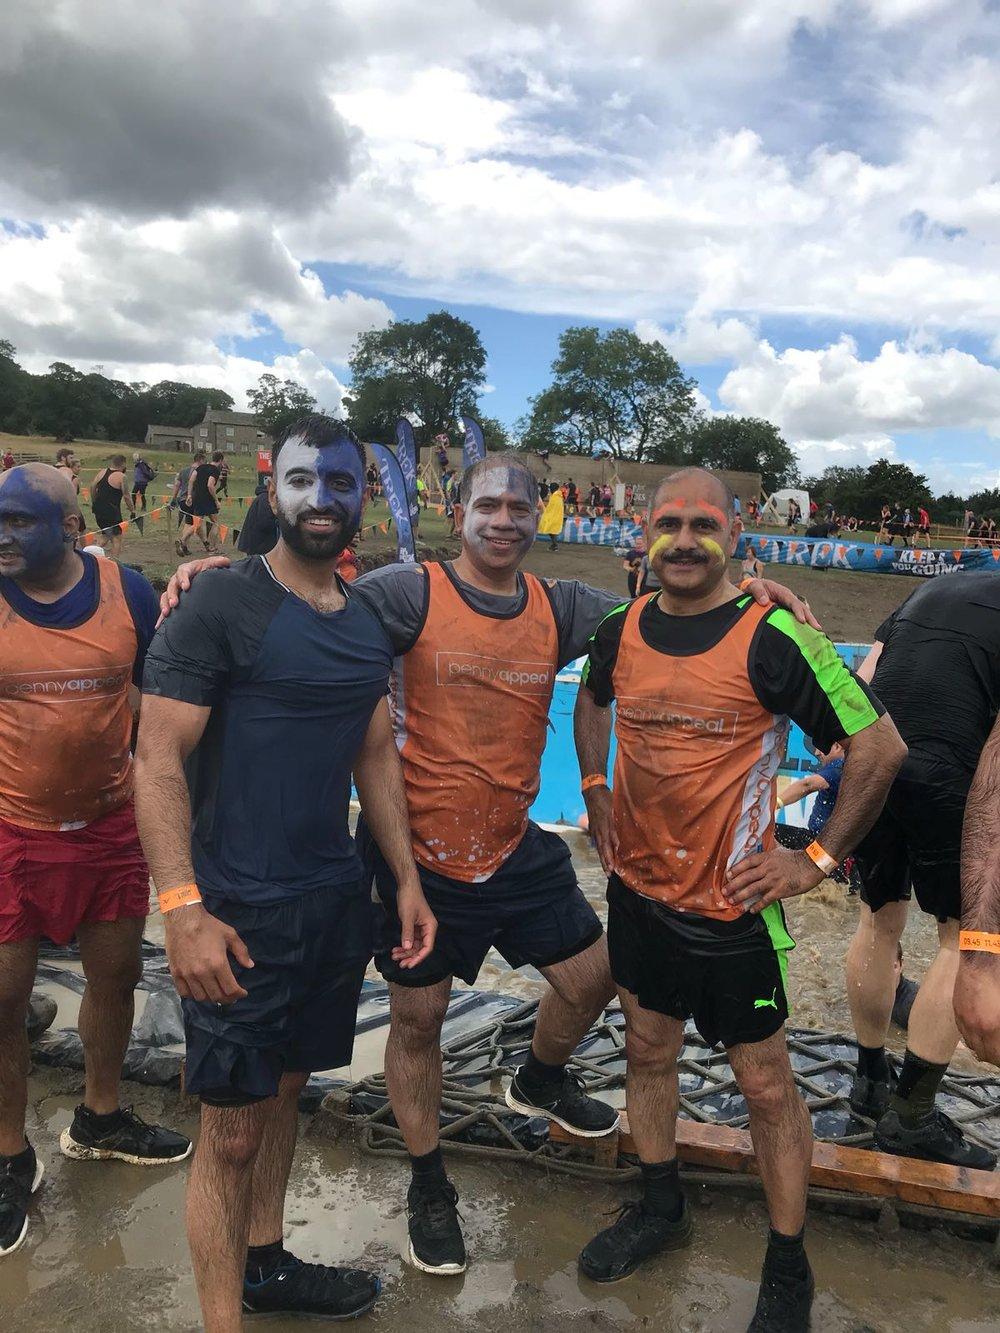 tough mudder boots and beards33.jpeg